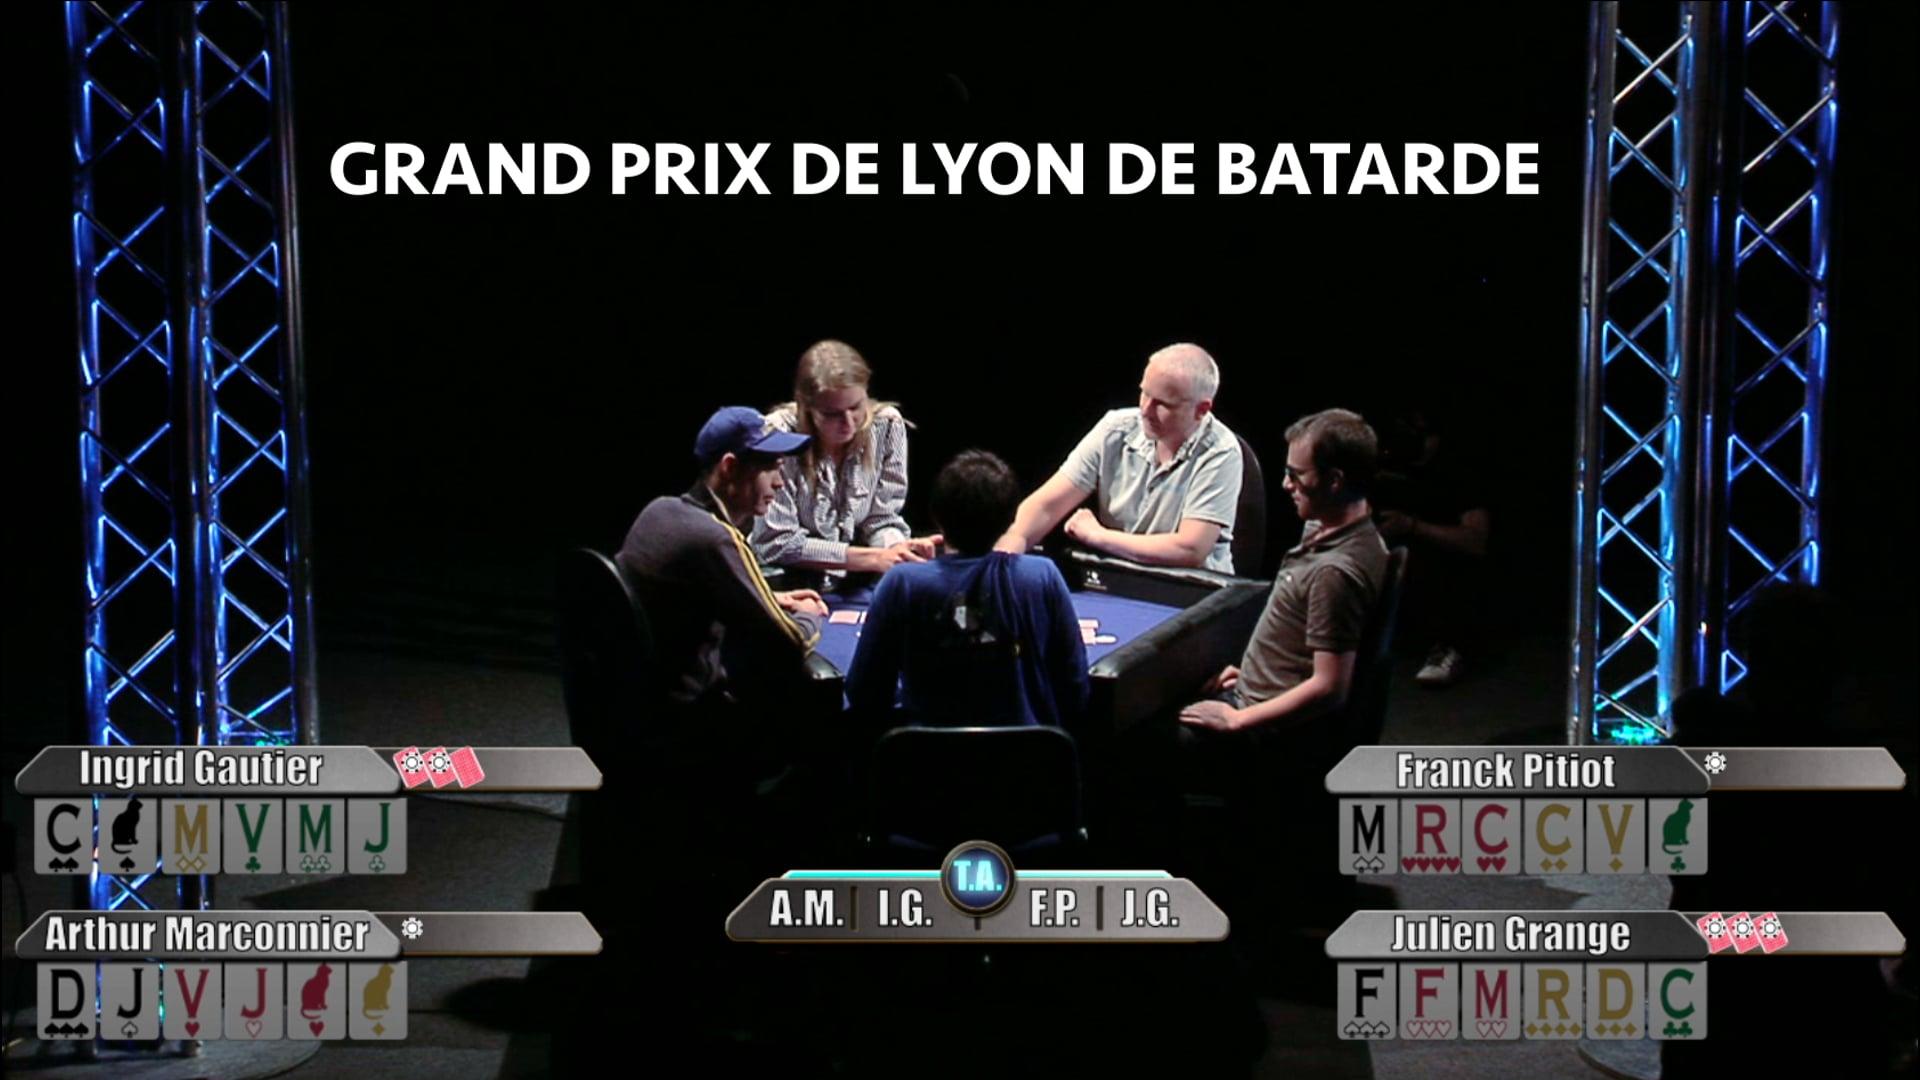 Grand Prix de Lyon de Bâtarde (jeu de cartes)